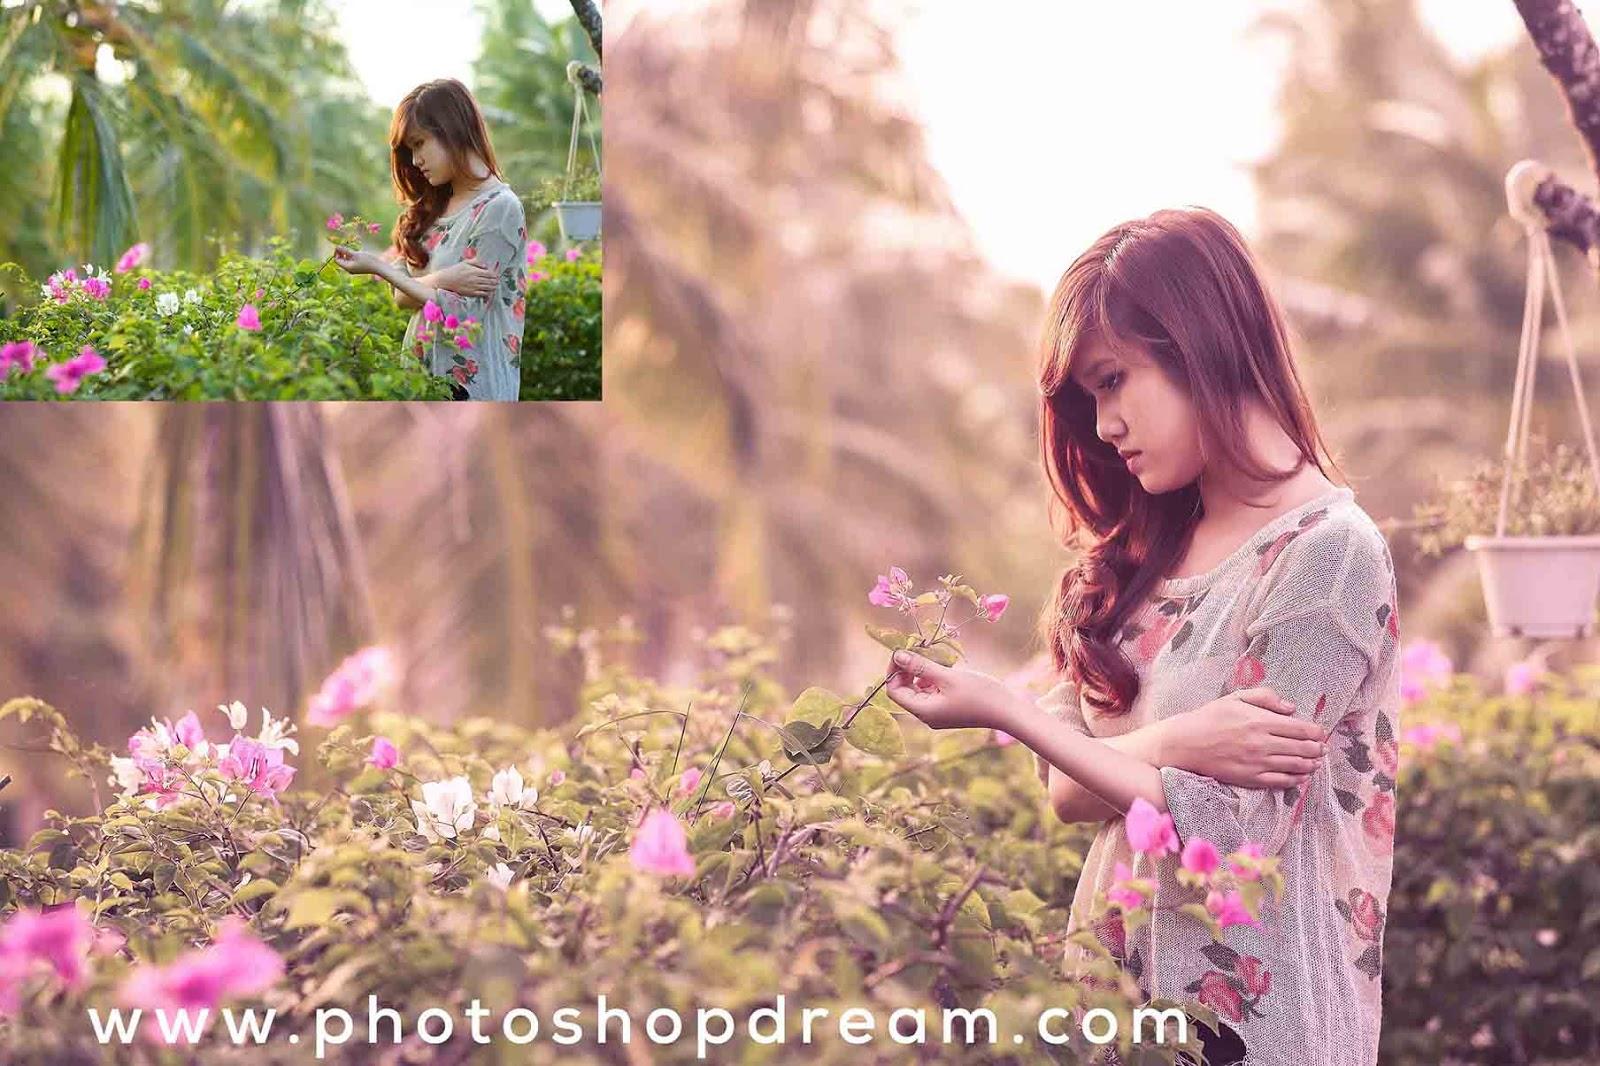 Camera Raw Presets Free Download - Best 10 Premium Presets